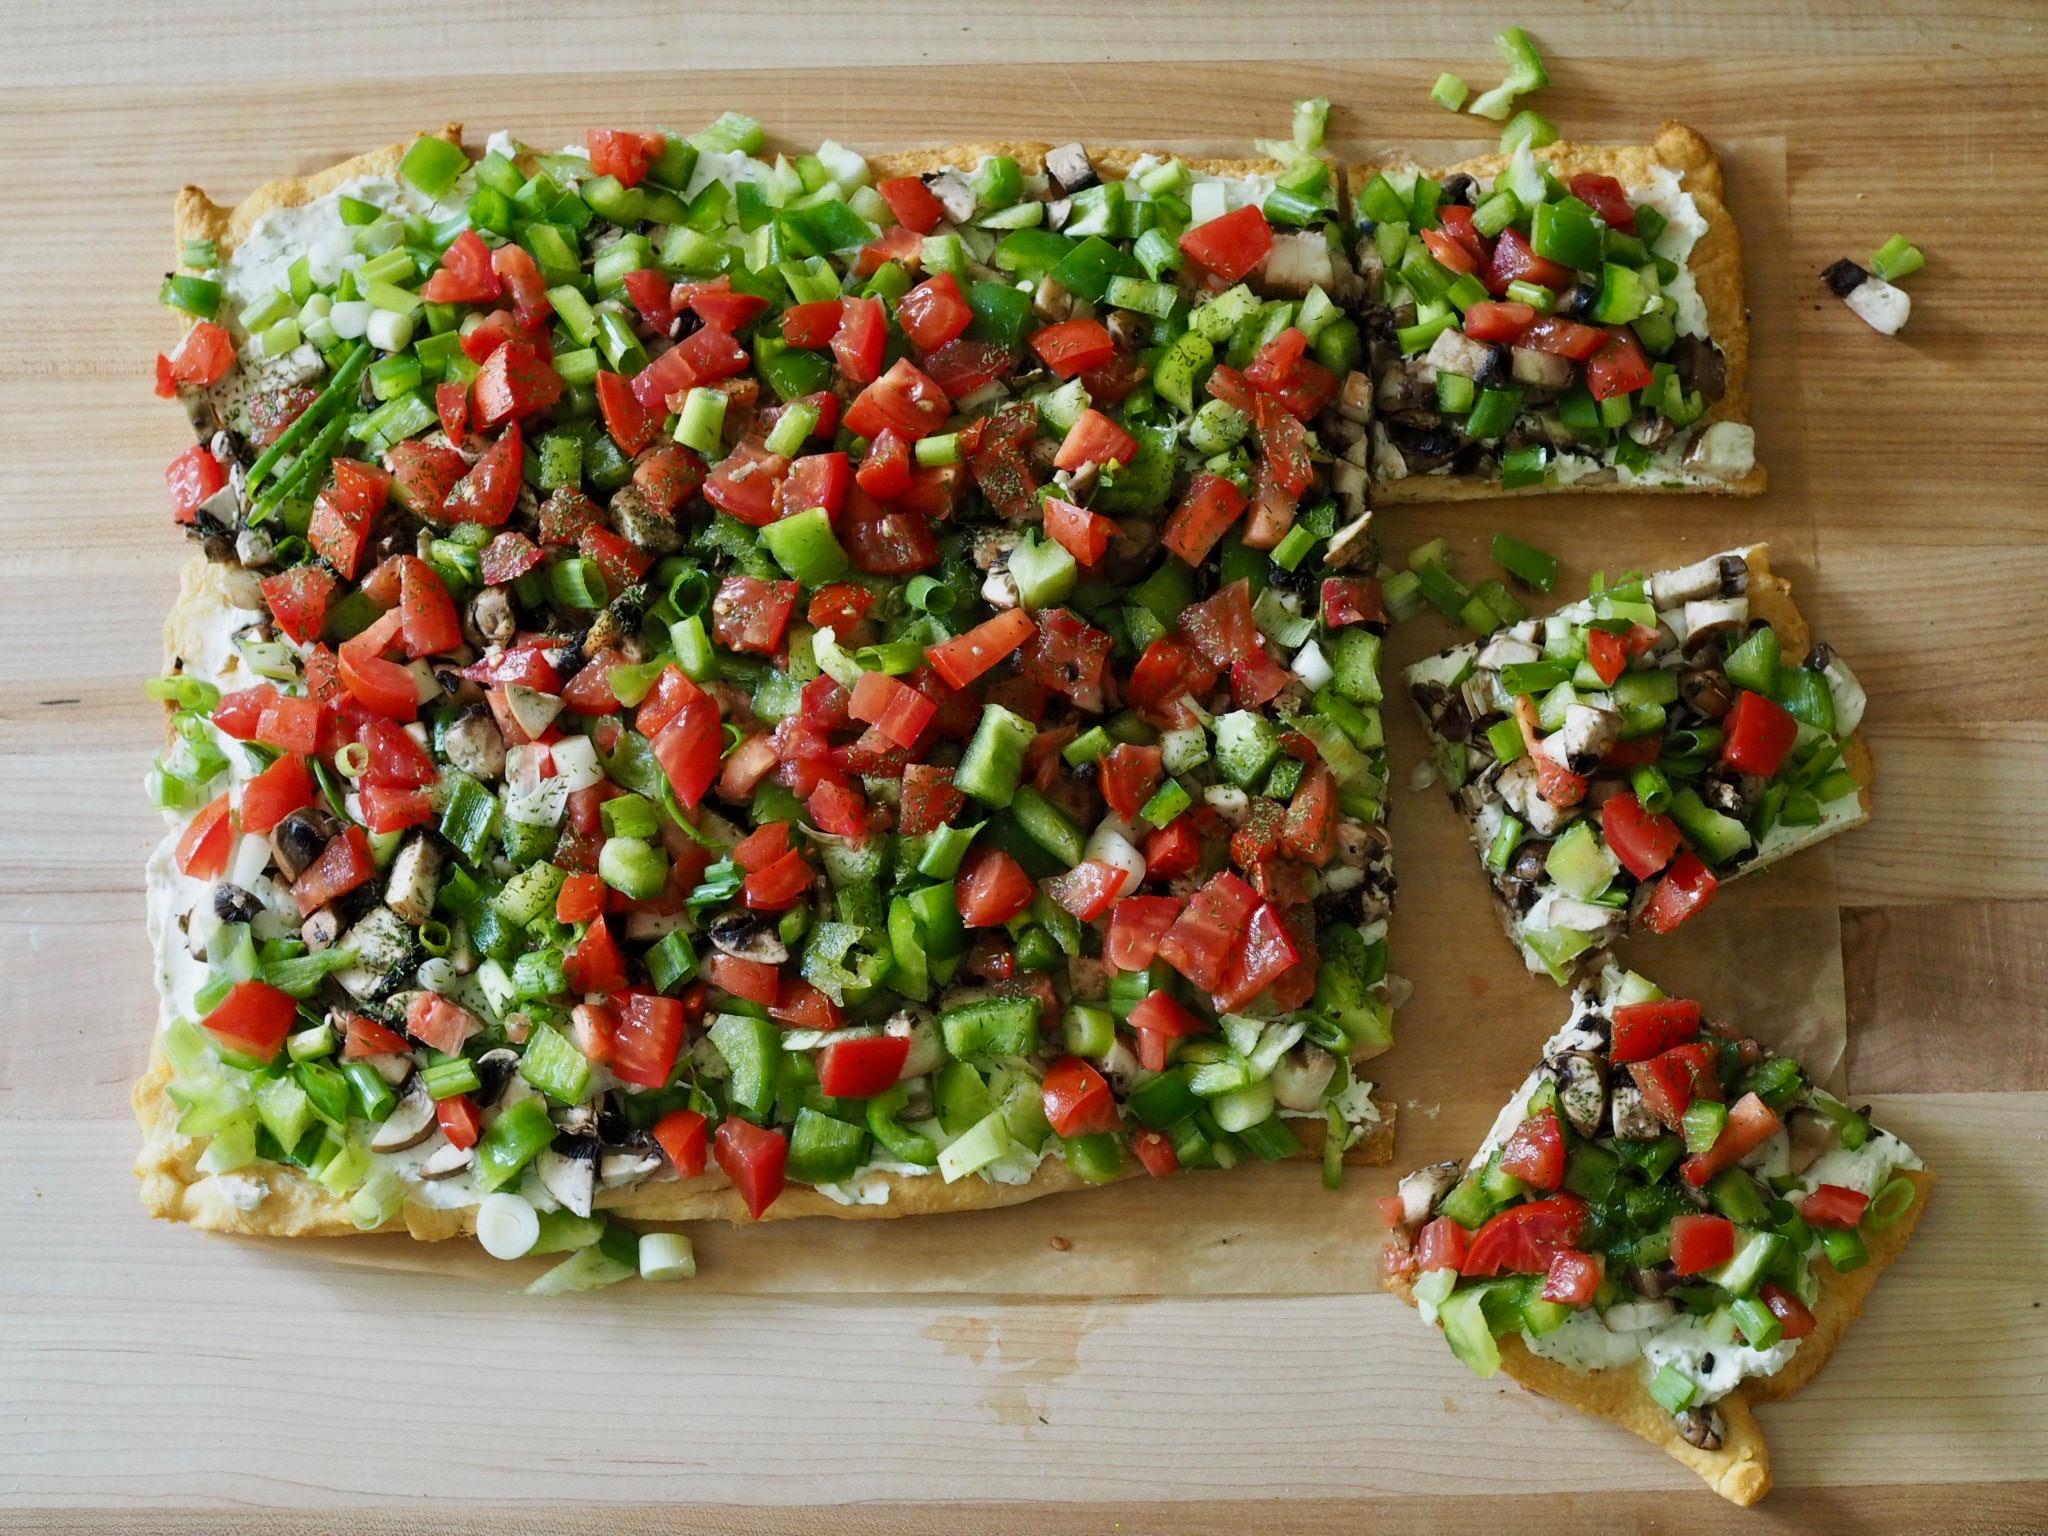 Crescent Roll Vegetable Pizza | @beesandbubbles